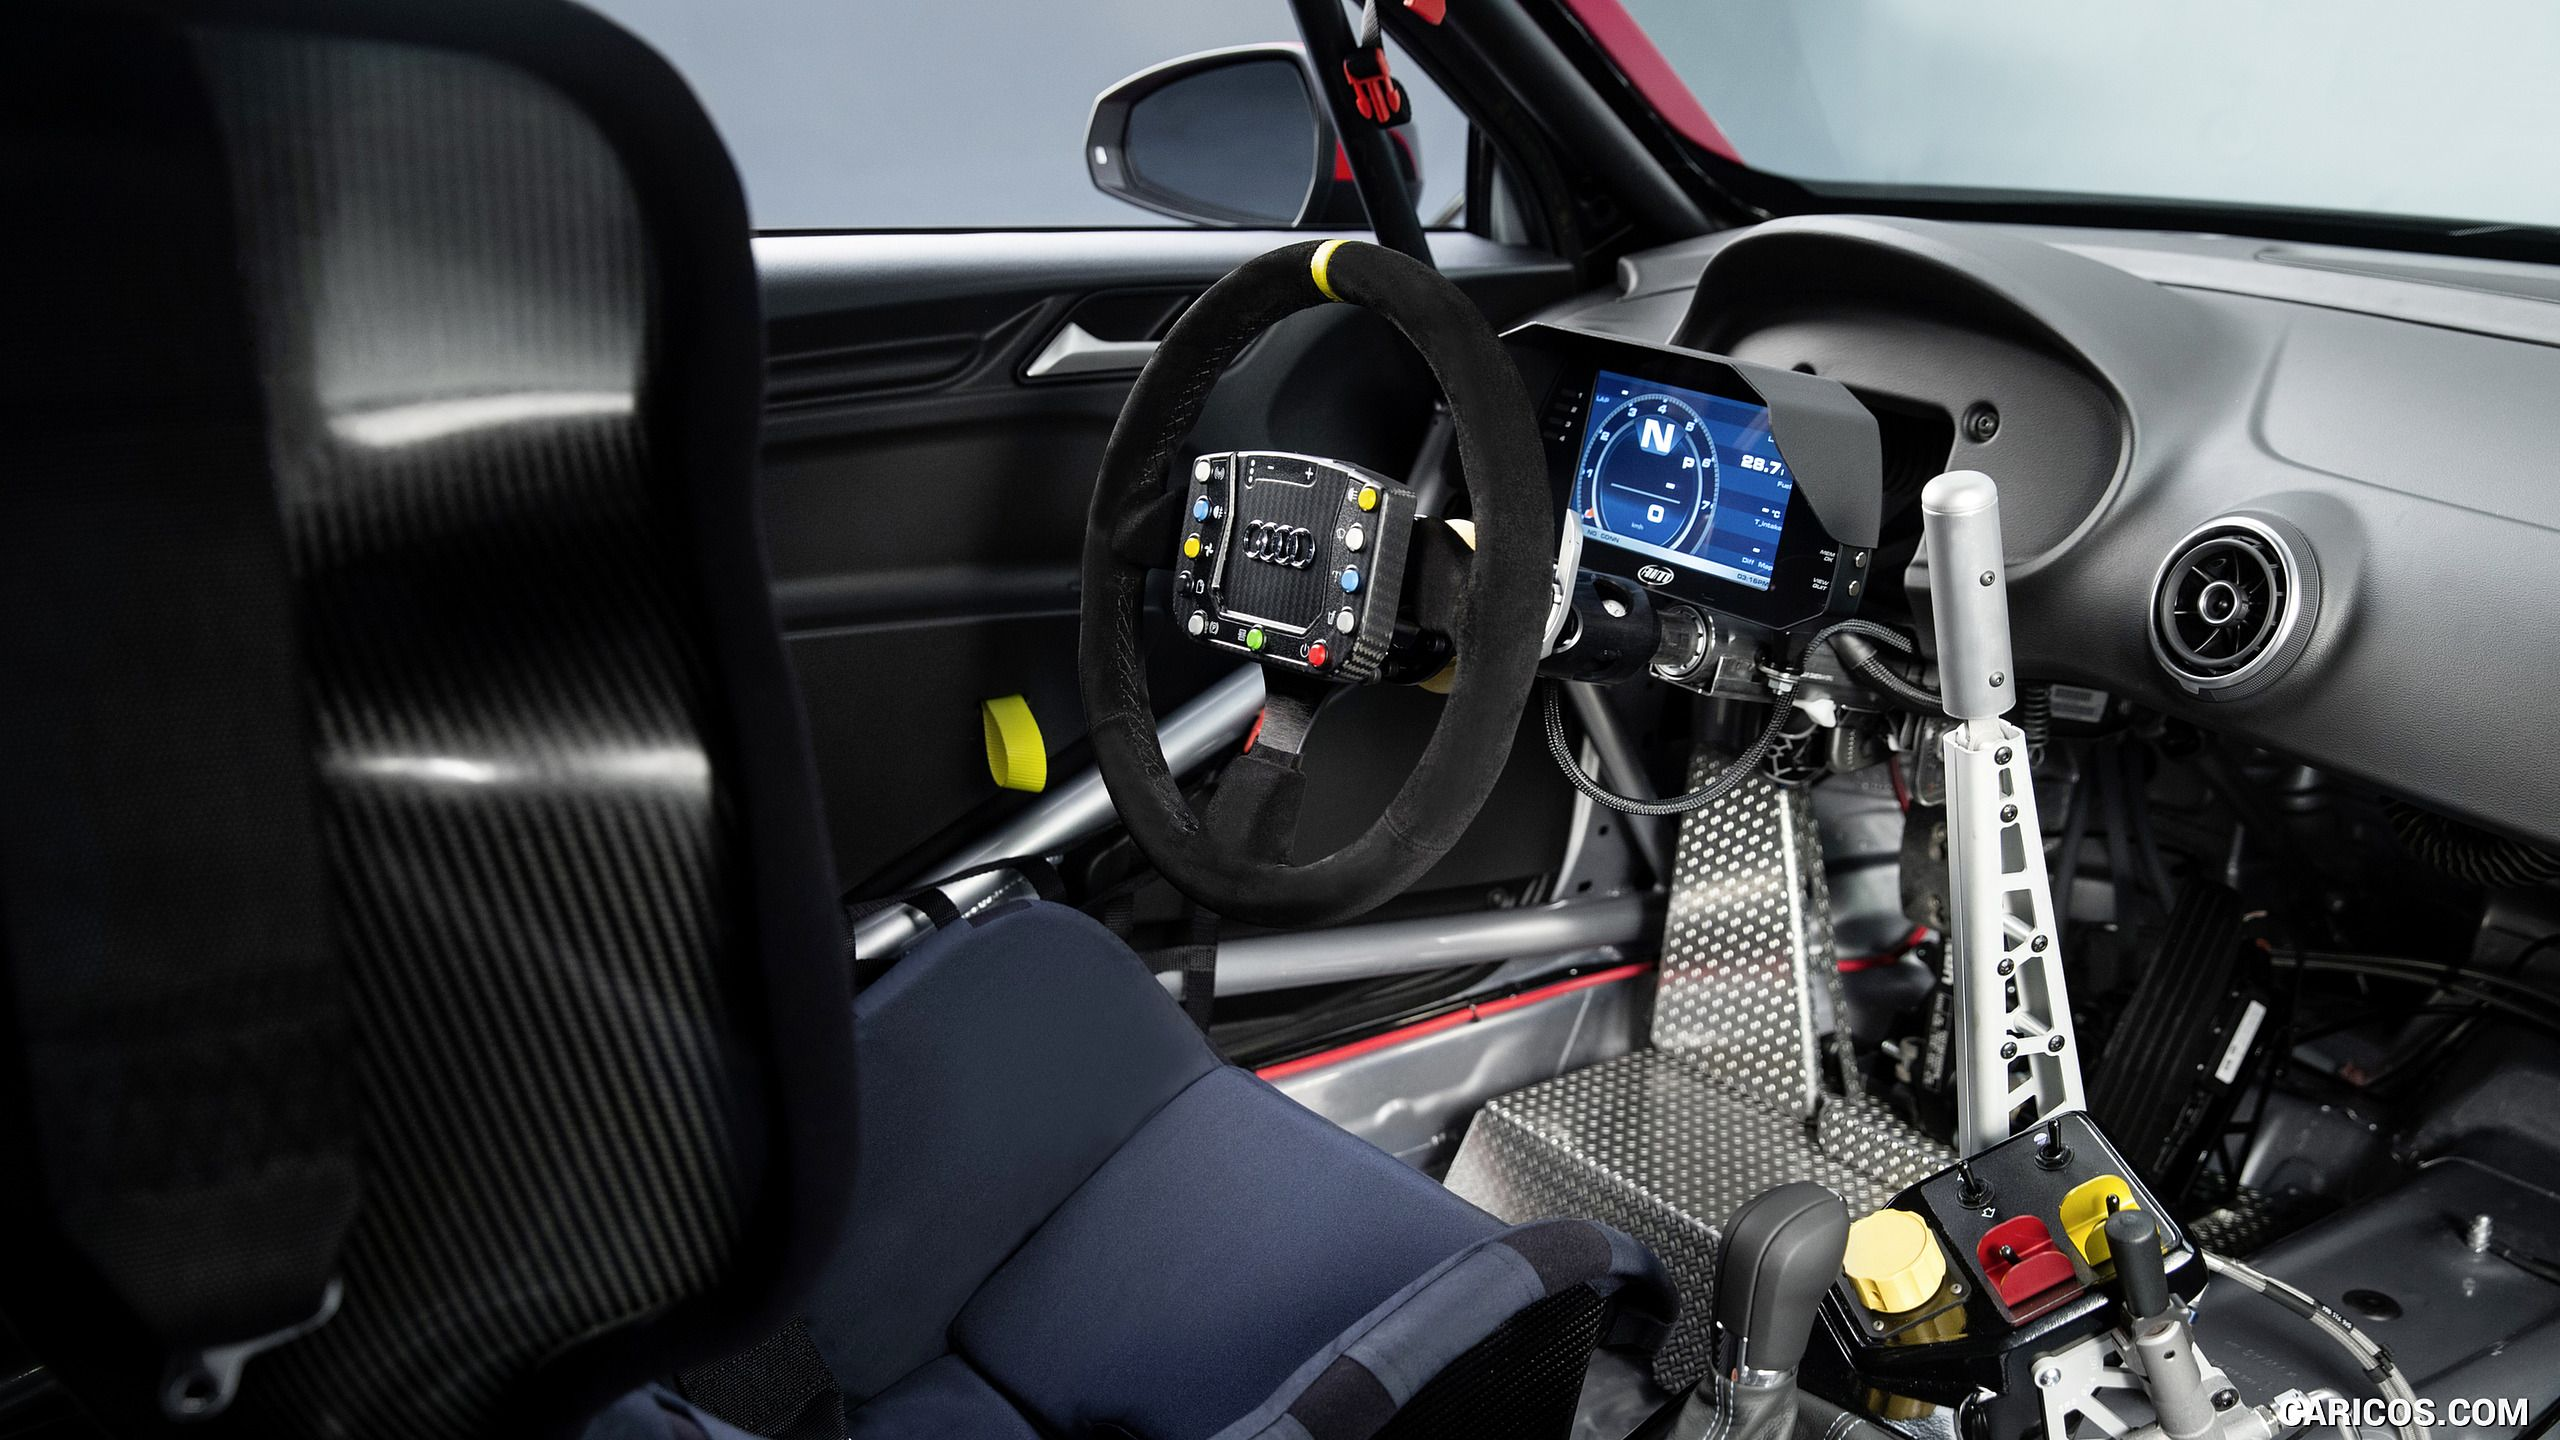 2017 Audi Rs 3 Lms Wallpaper Audi Rs3 Audi Audi Rs